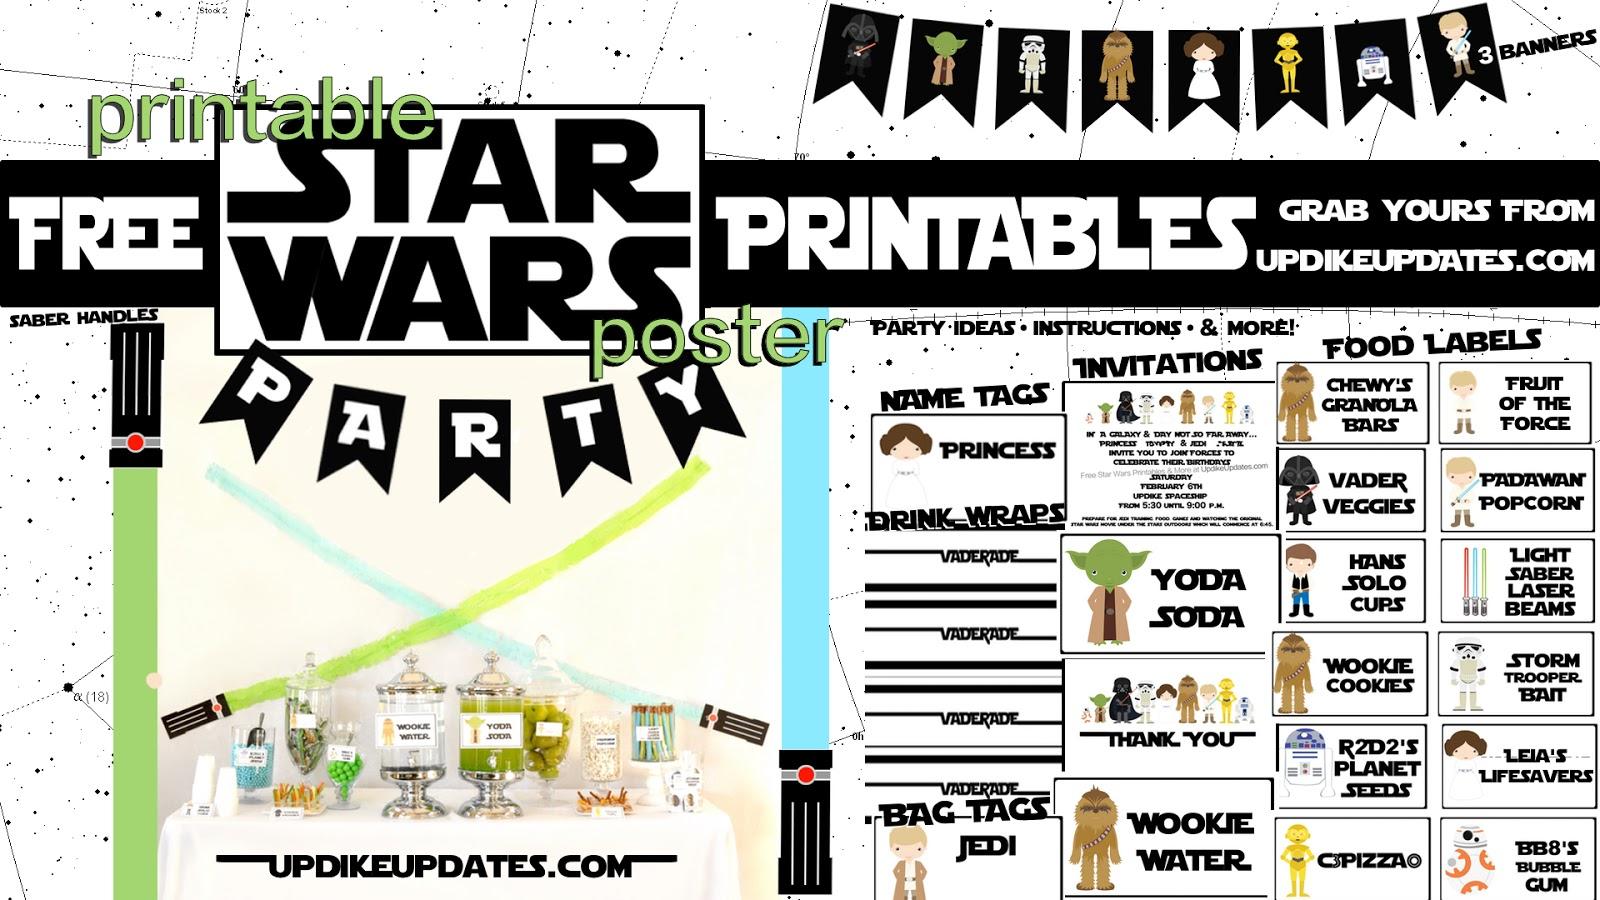 Updikeupdates One Stop Star Wars Party Shop